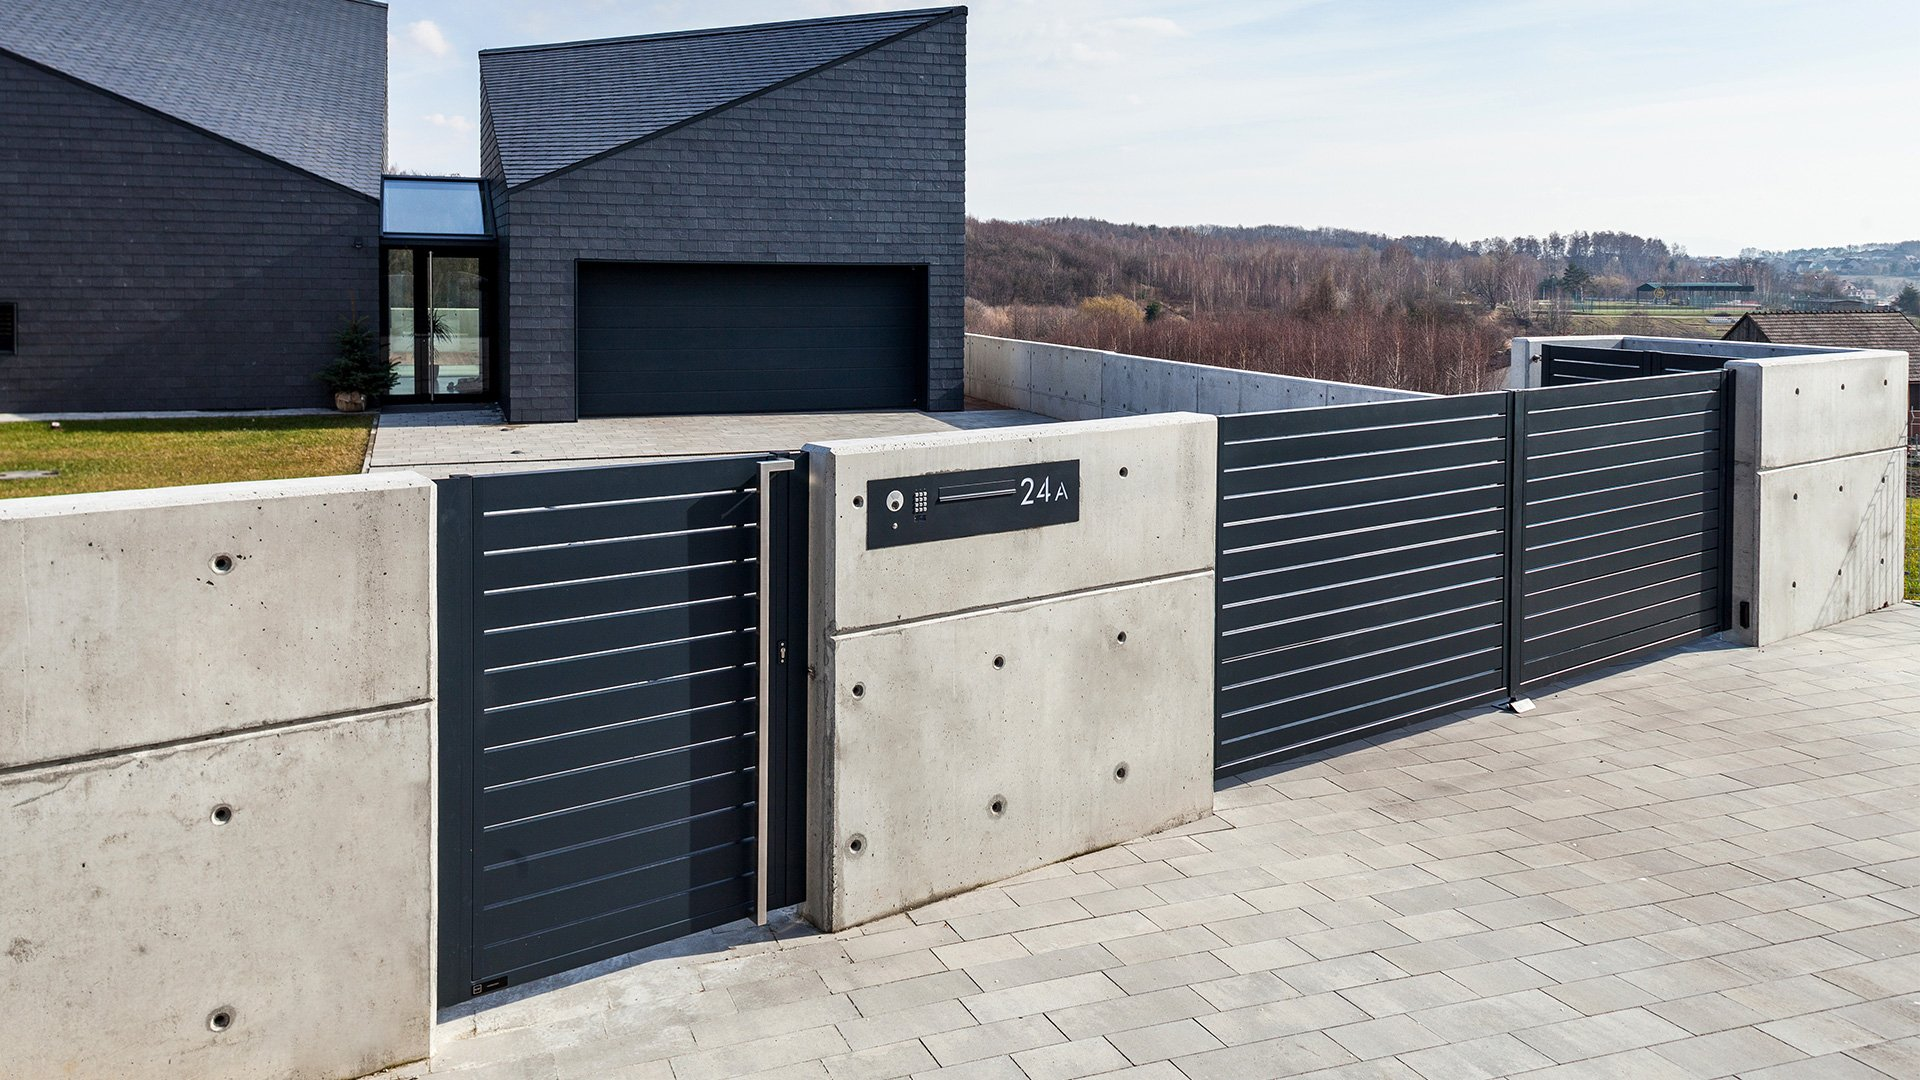 Inteligentny Beton architektoniczny – wady i zalety FU59